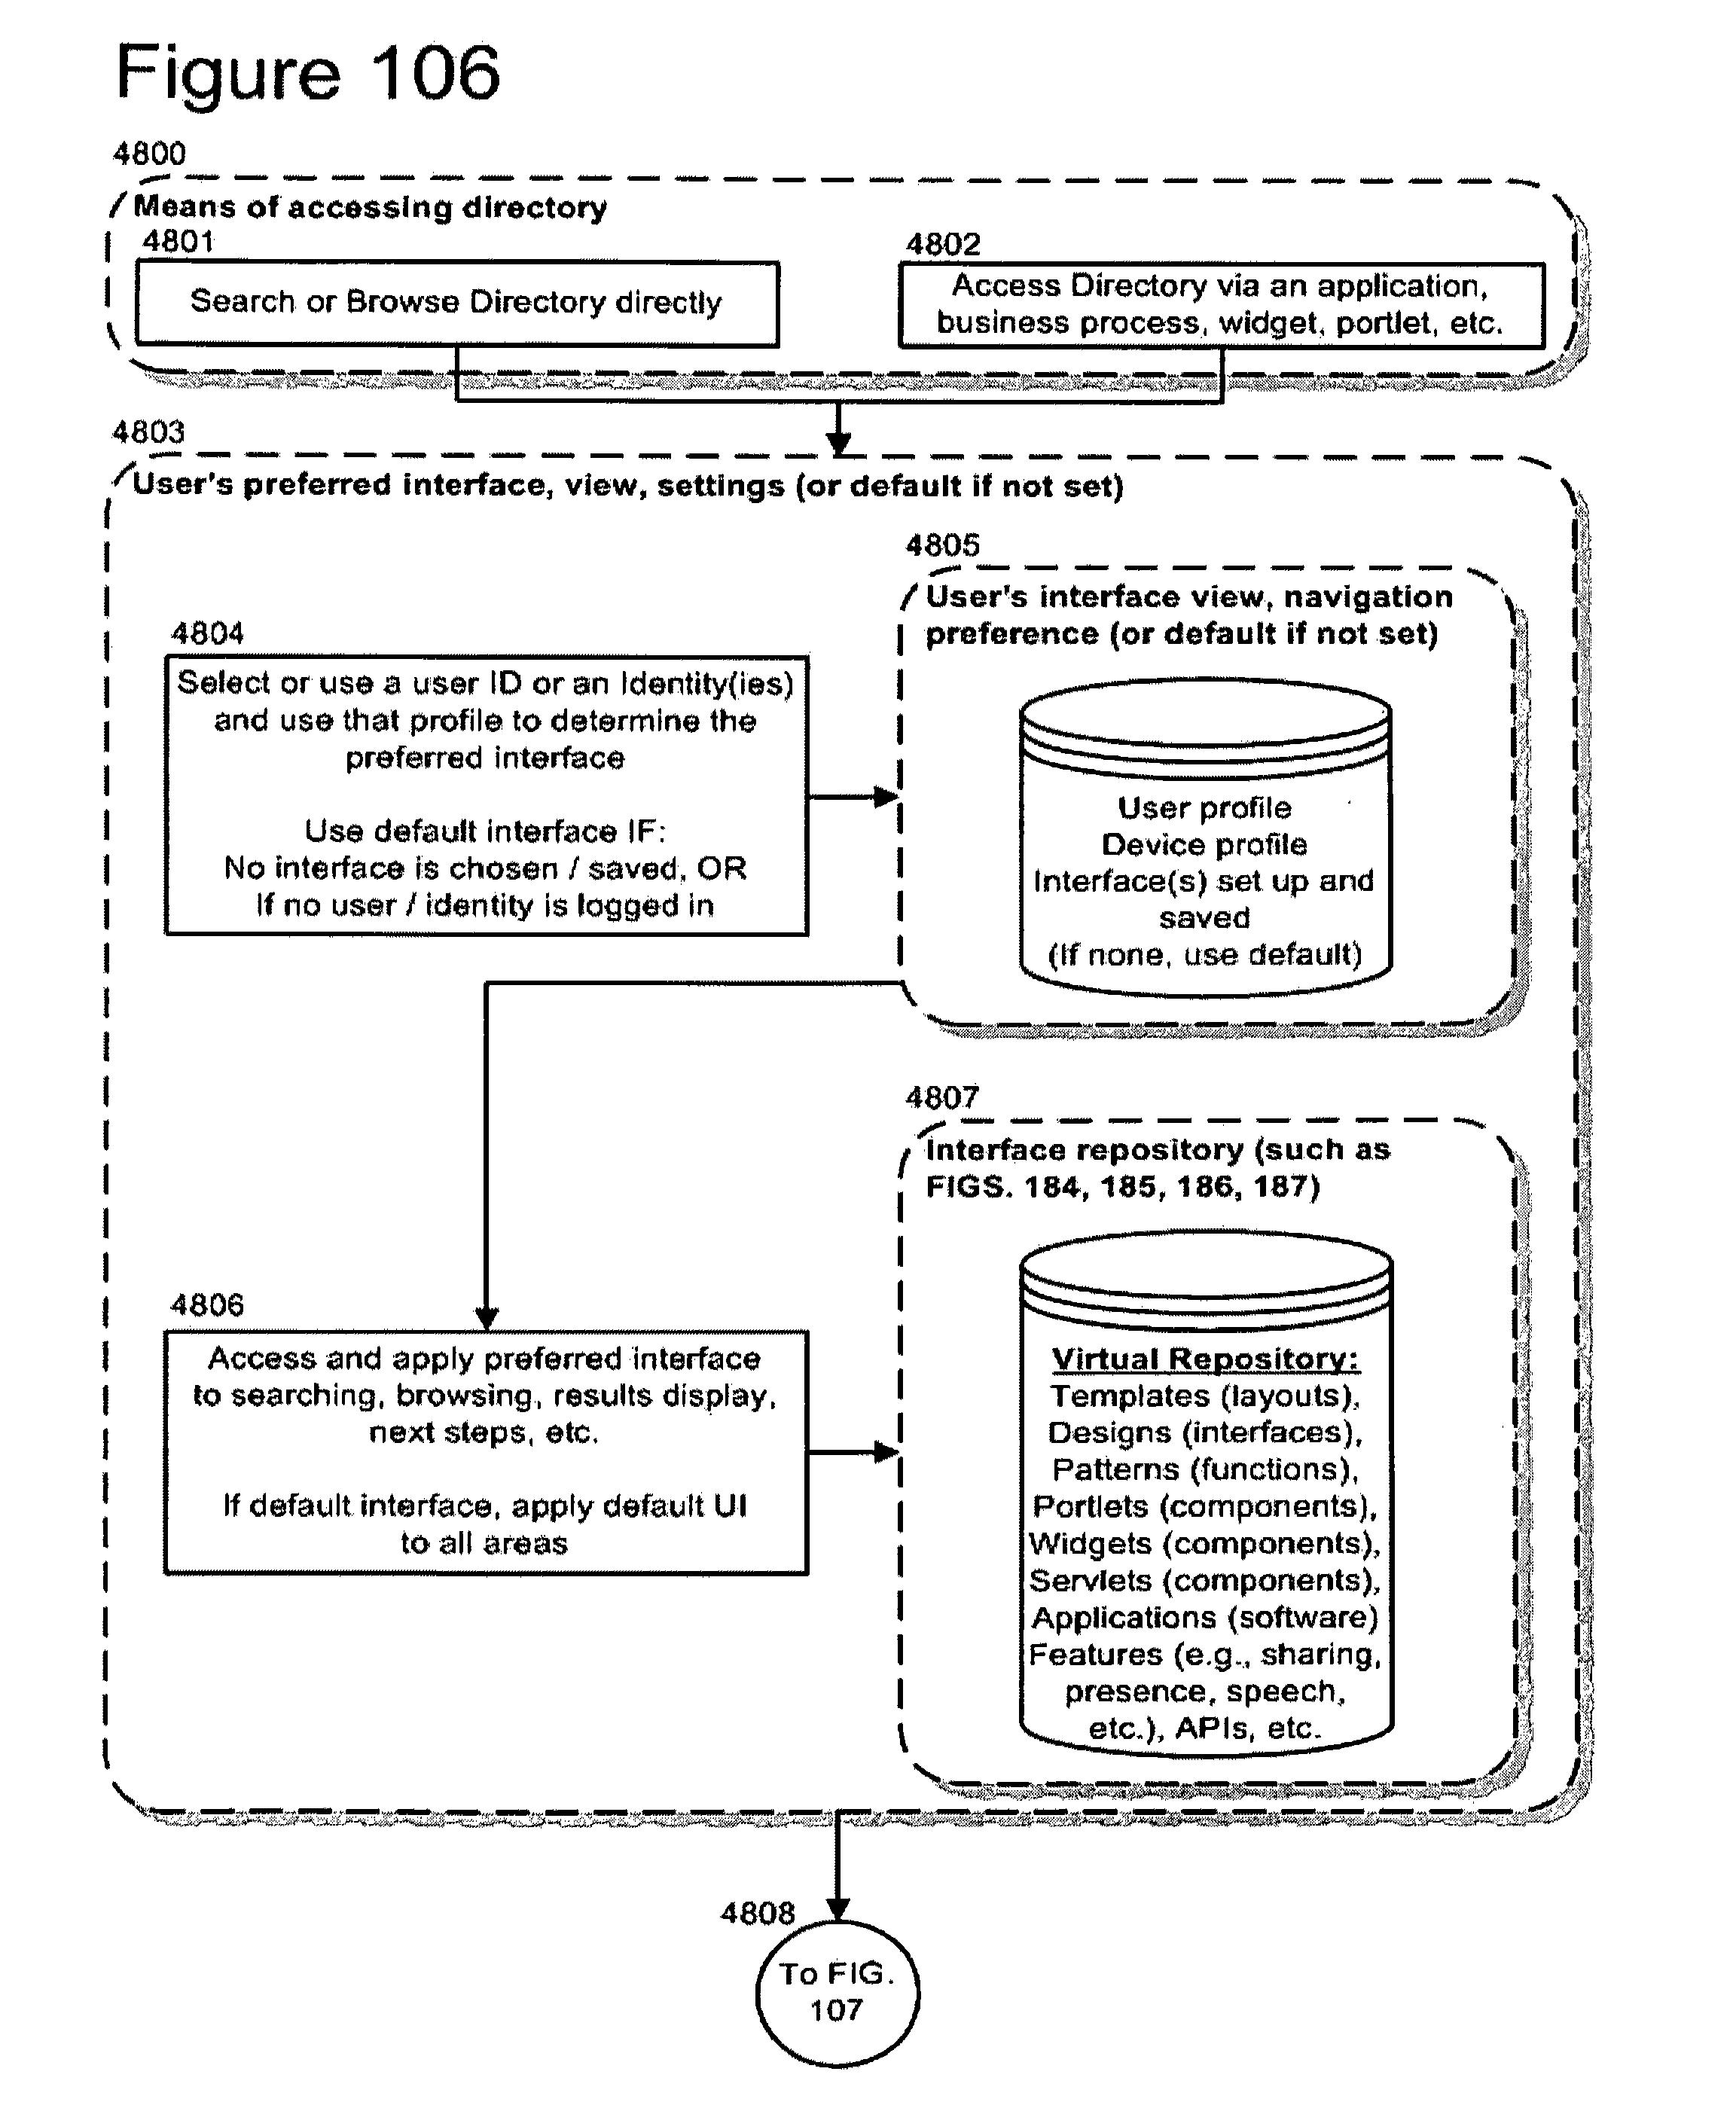 Patent US 9,183,560 B2